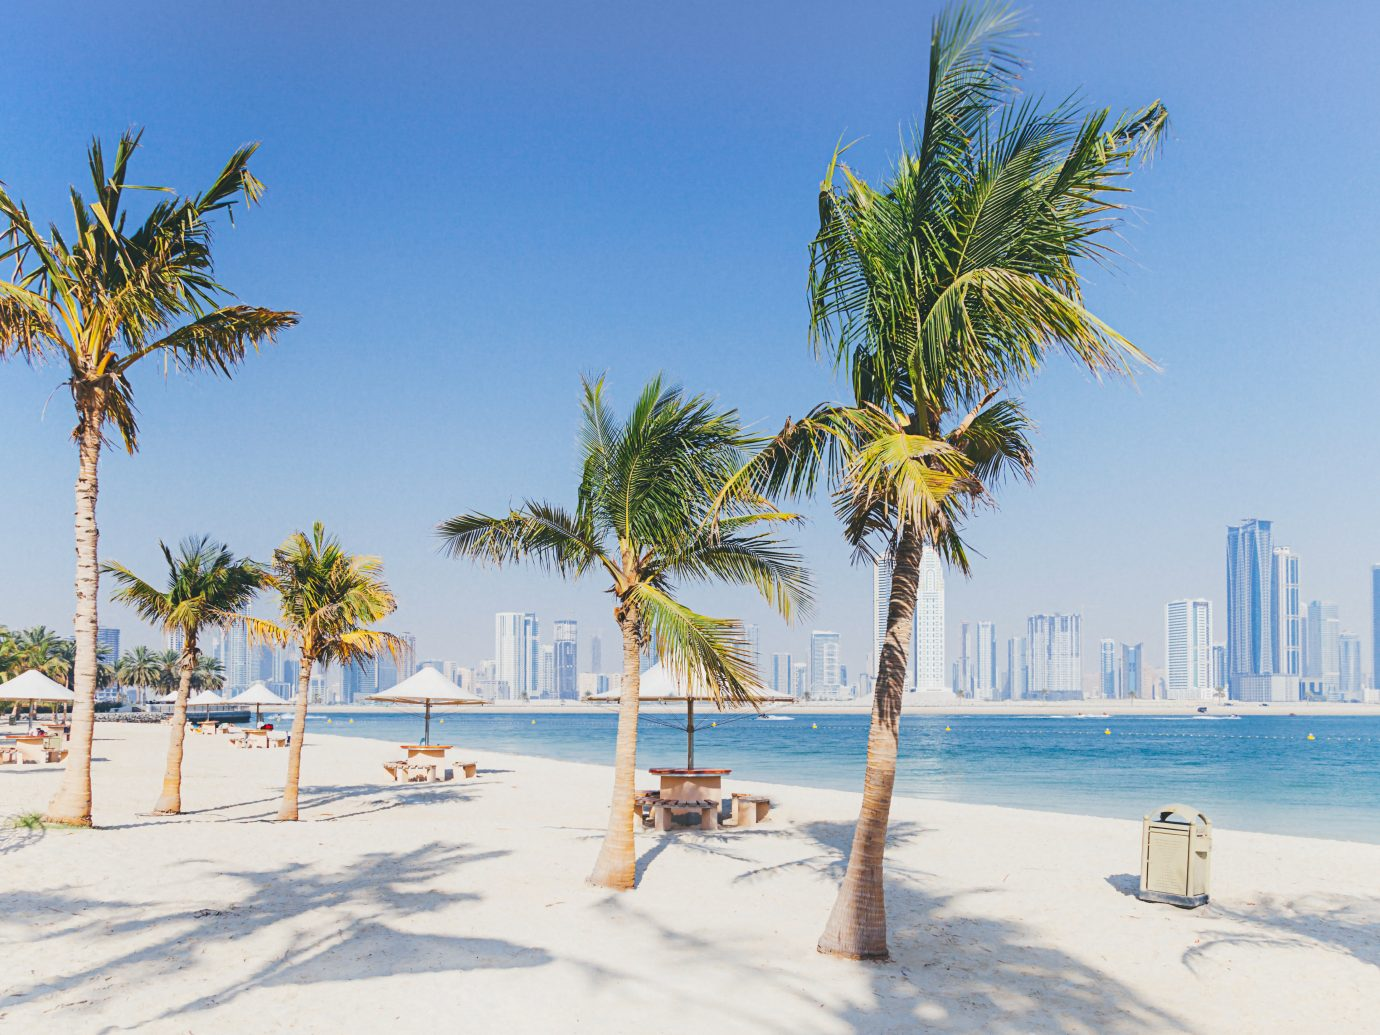 City view from Al Mamzar Beach Park in Dubai, UAE